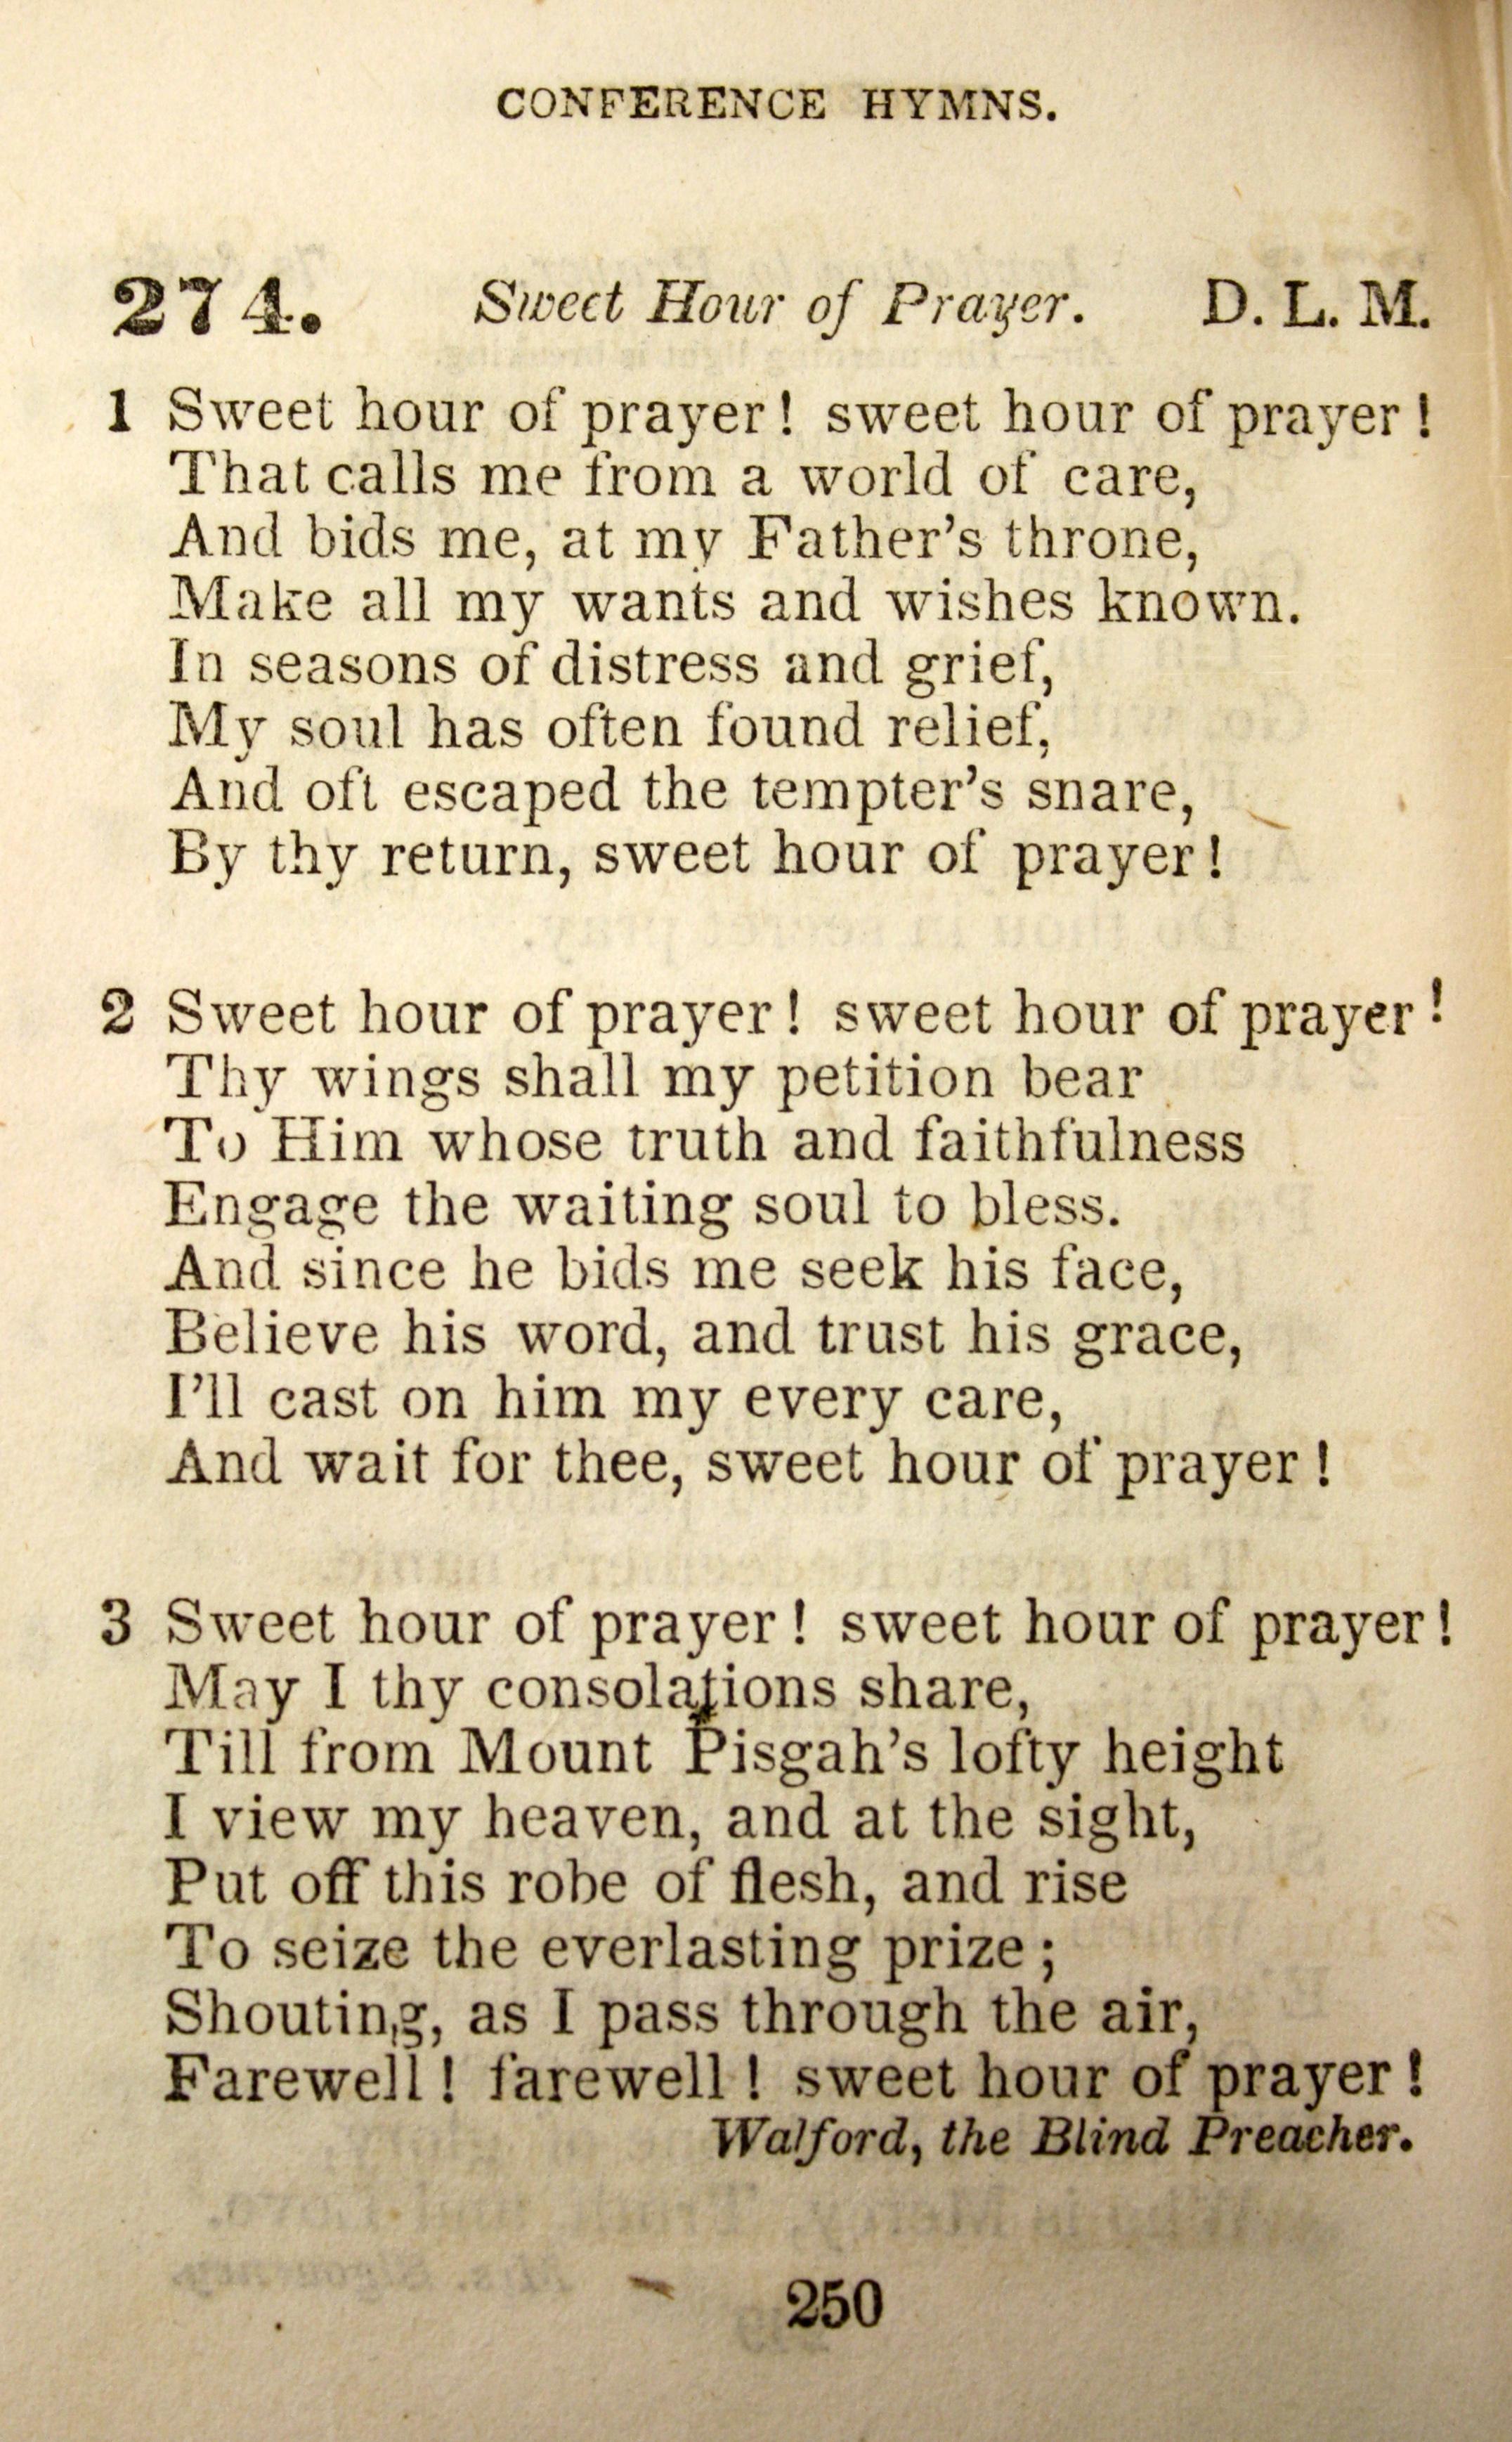 Fig. 2.     Conference Hymns , ed. John Dowling (NY: Edward H. Fletcher, 1849).